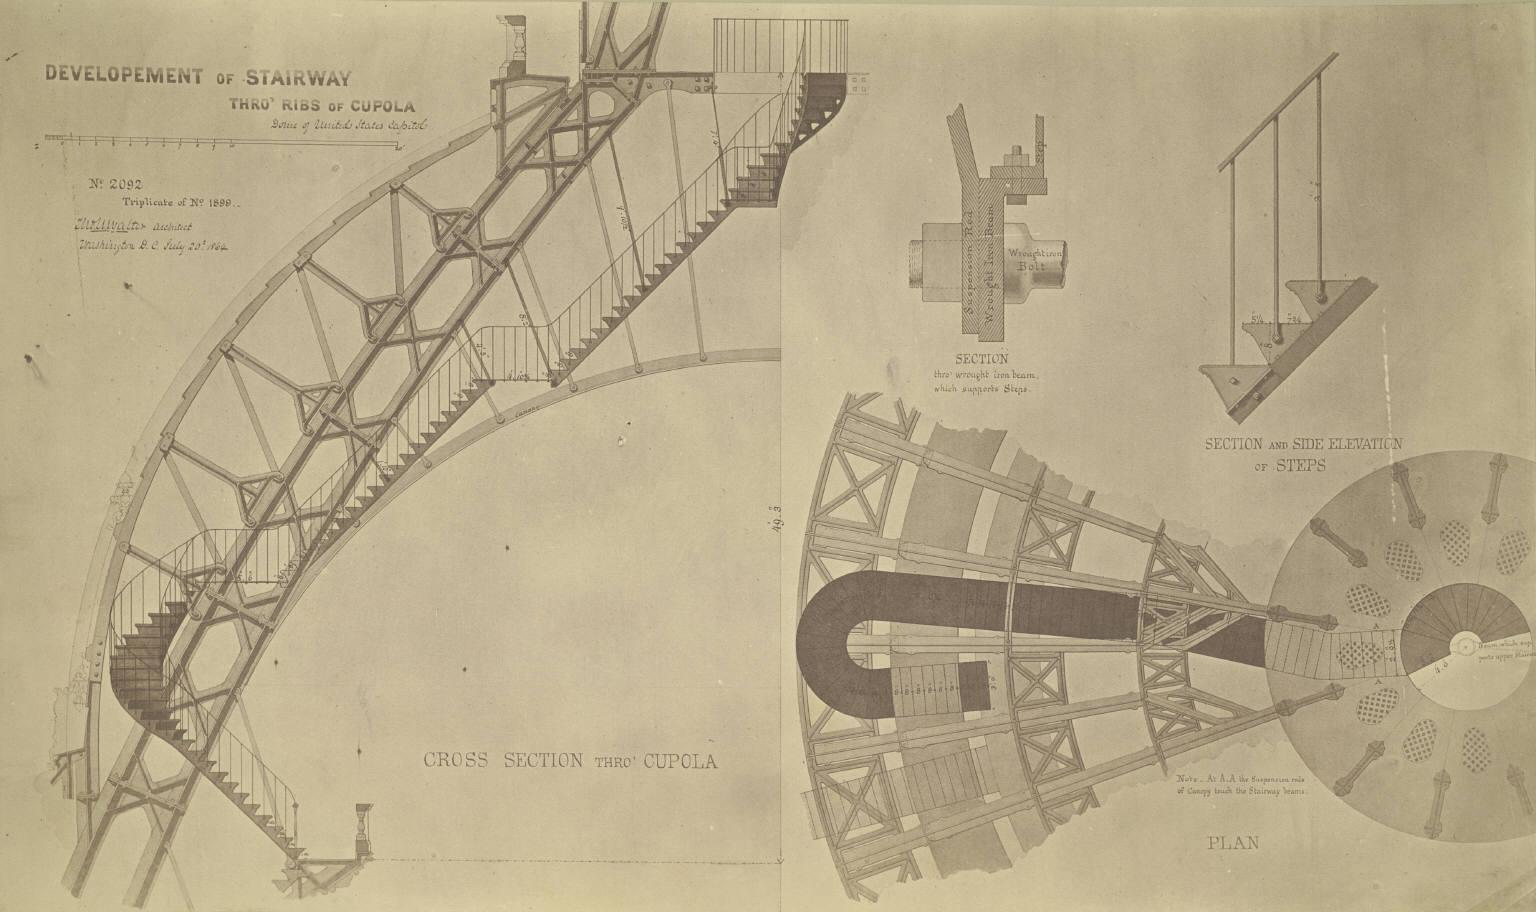 File:Washington, D. C. Cross Section of Cupola on U. S. Capitol  (3678919842).